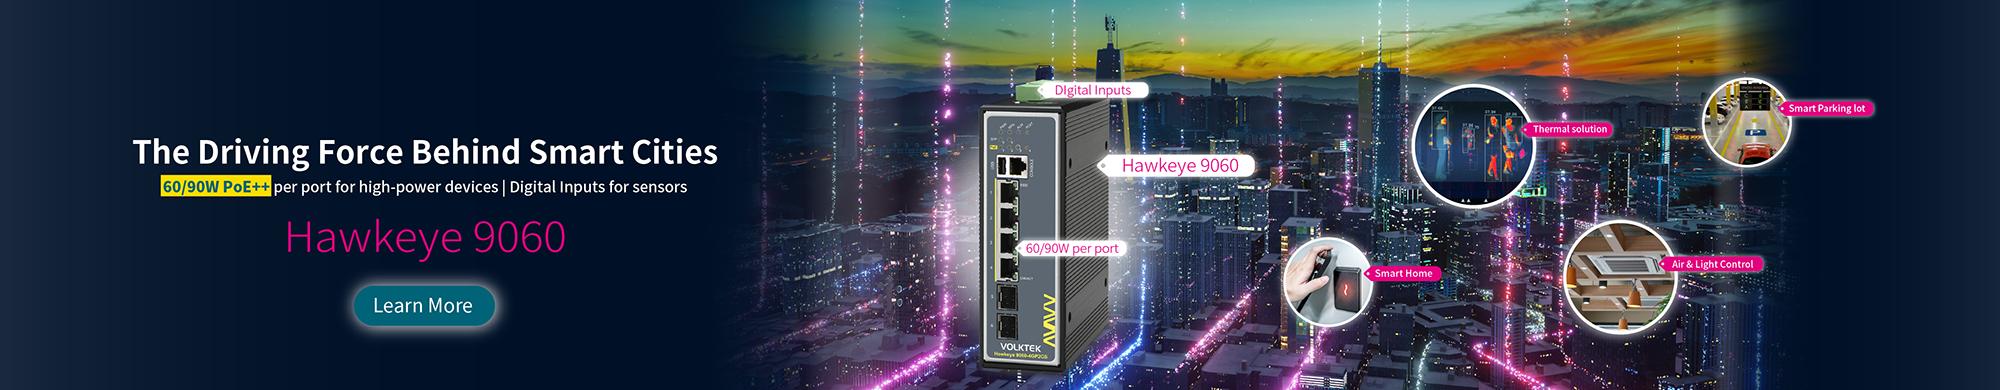 Smart City Solution Hawkeye 9060